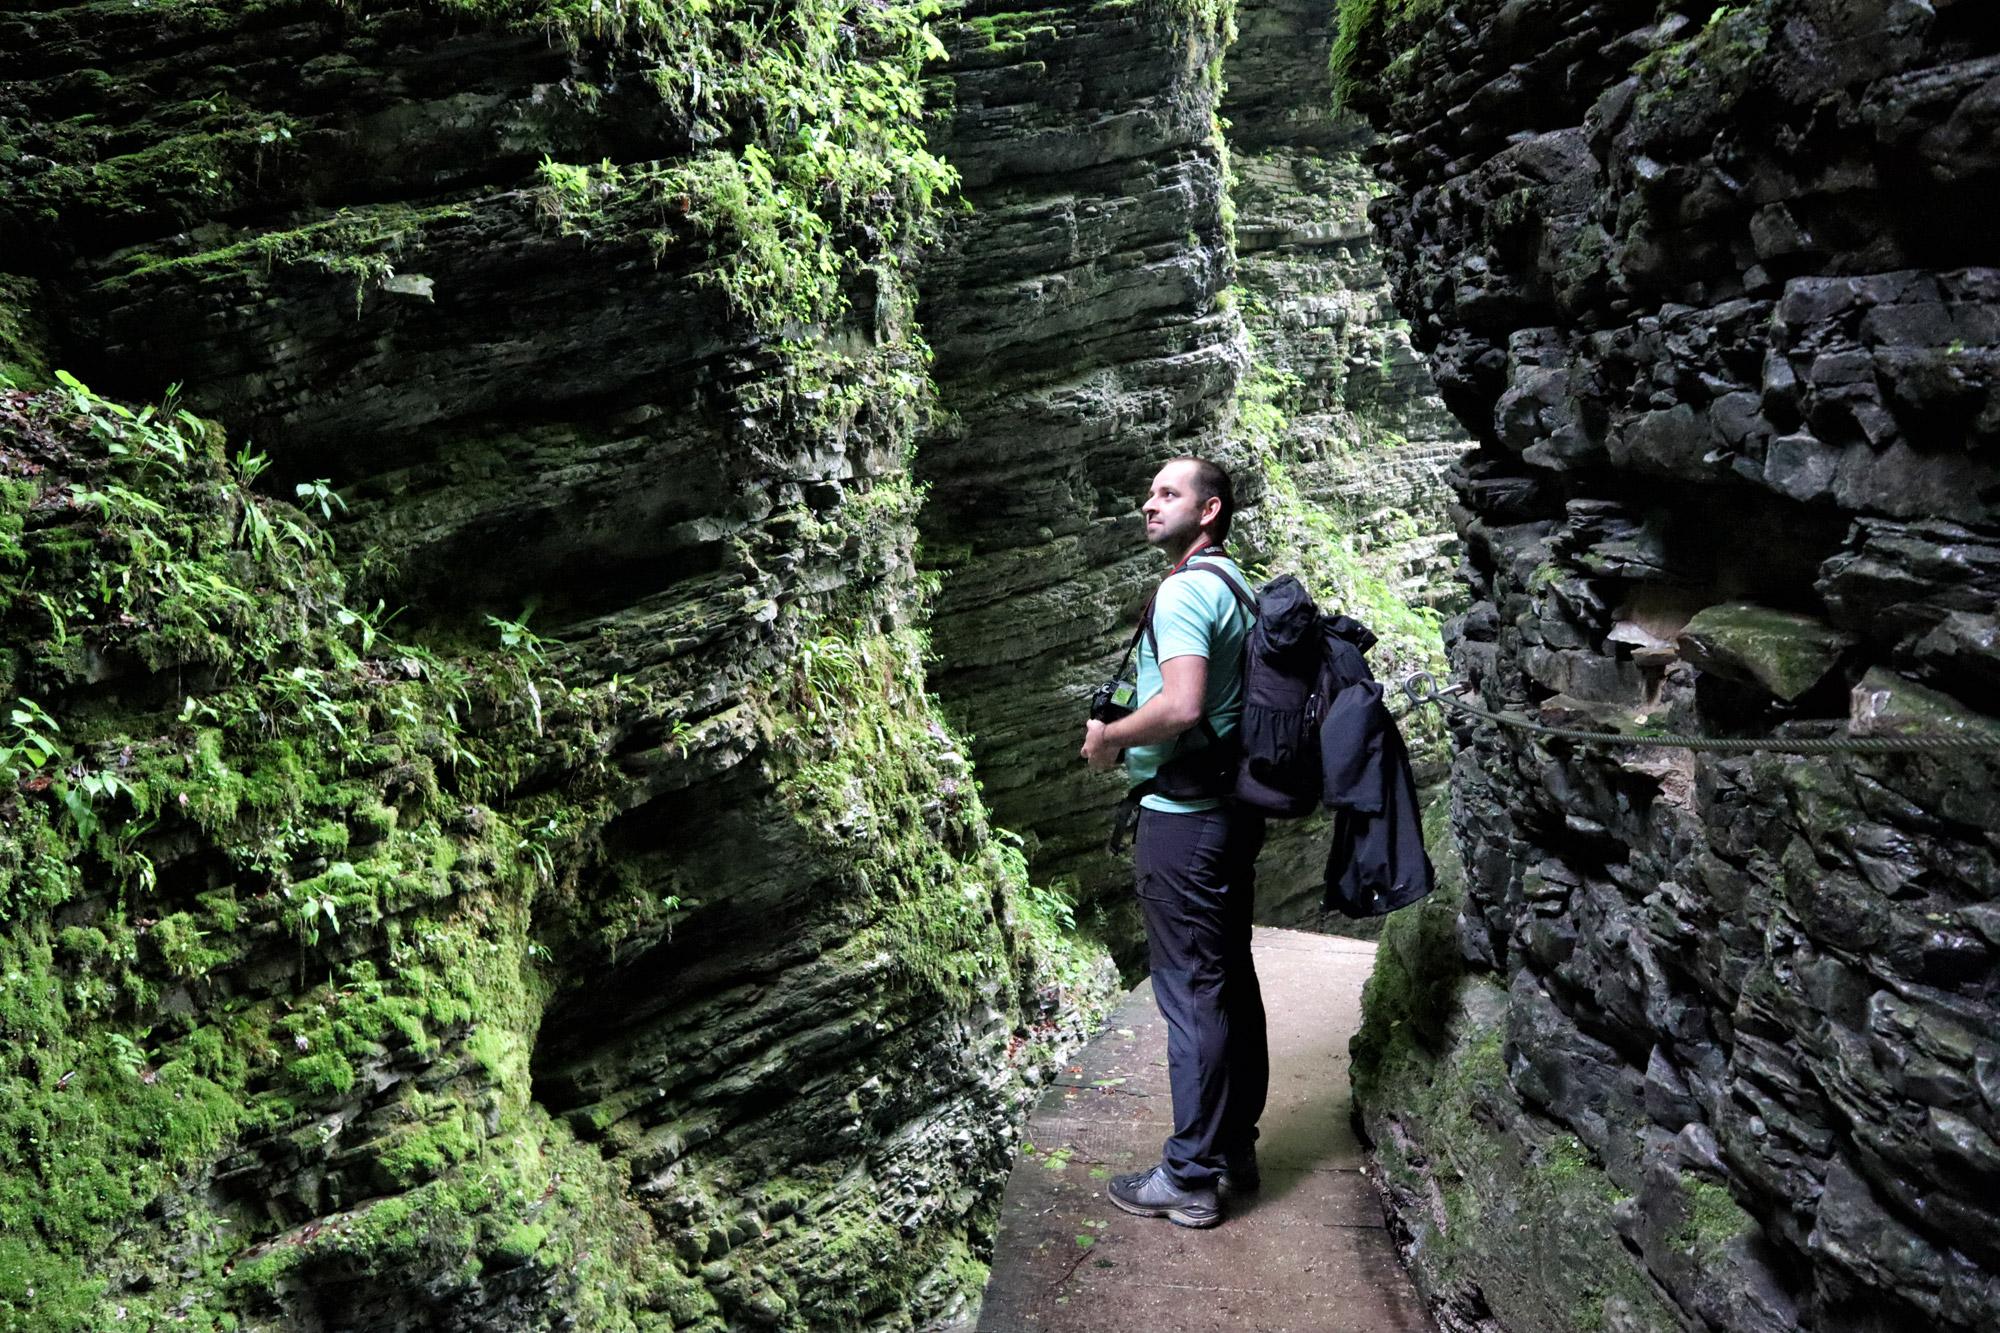 Soška pot wandeling in Slovenië - Slap Kozjak